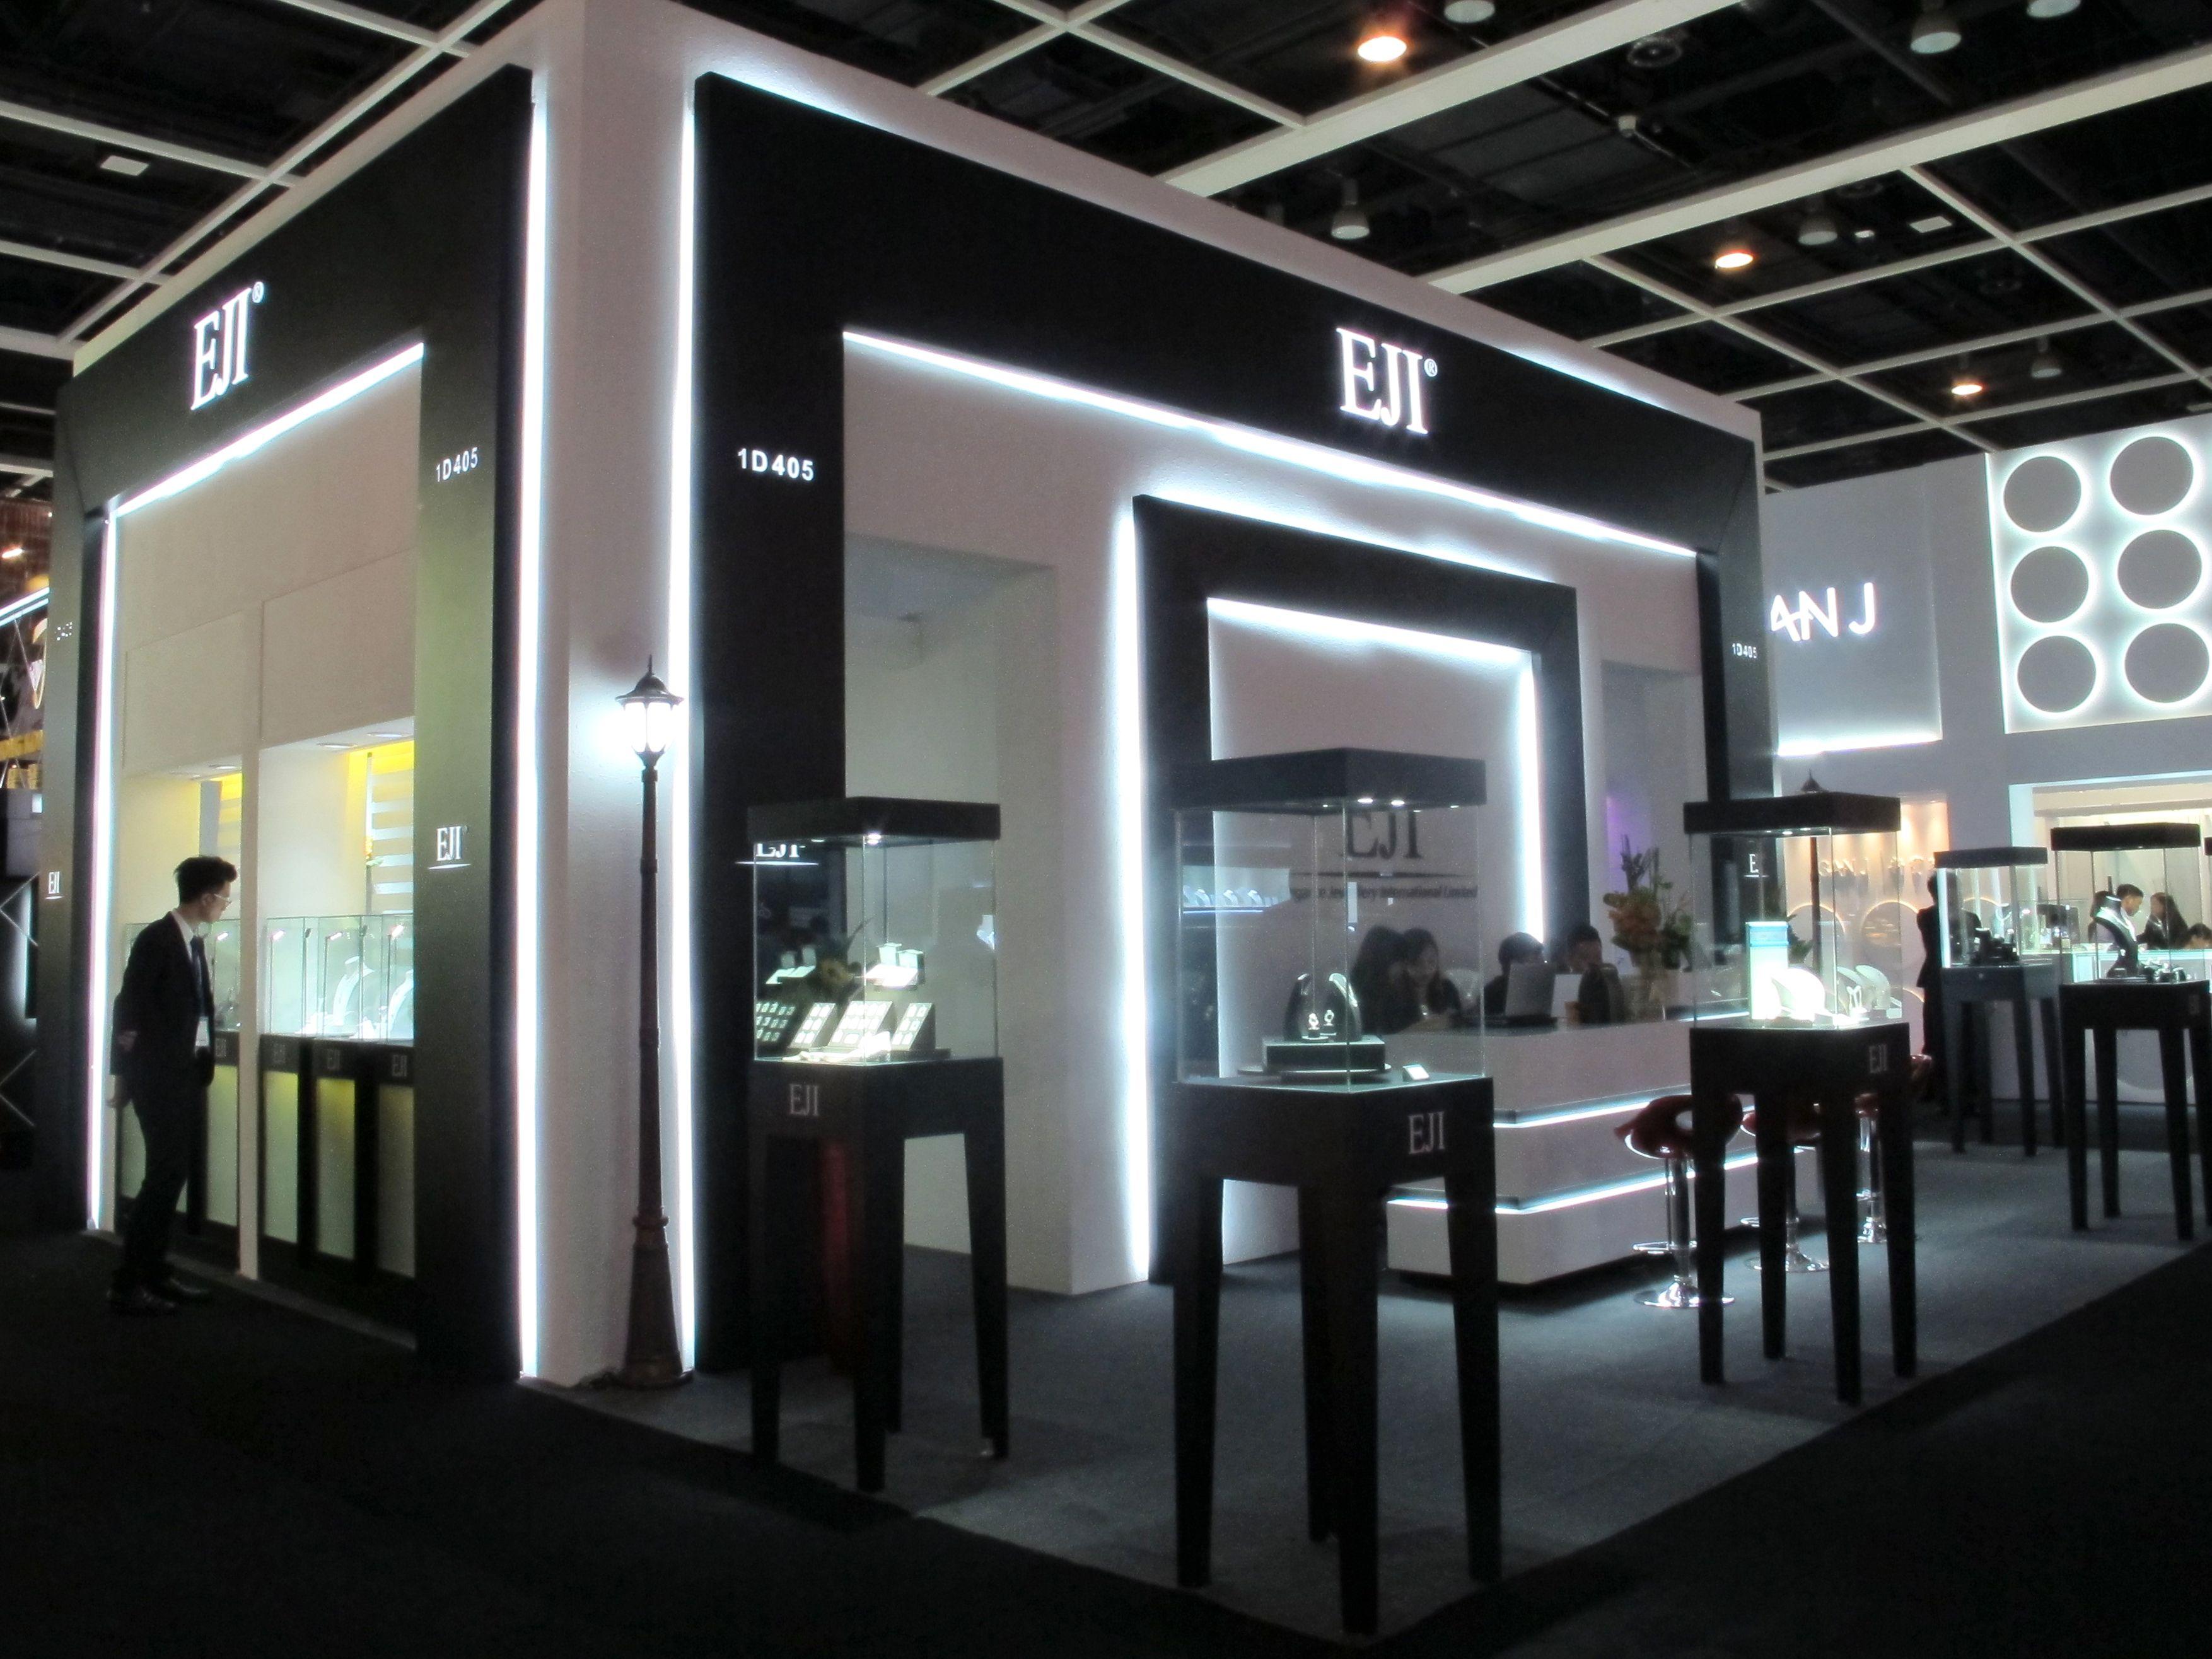 Jewellery Exhibition Booth Design : June hong kong jewellery and gem fair